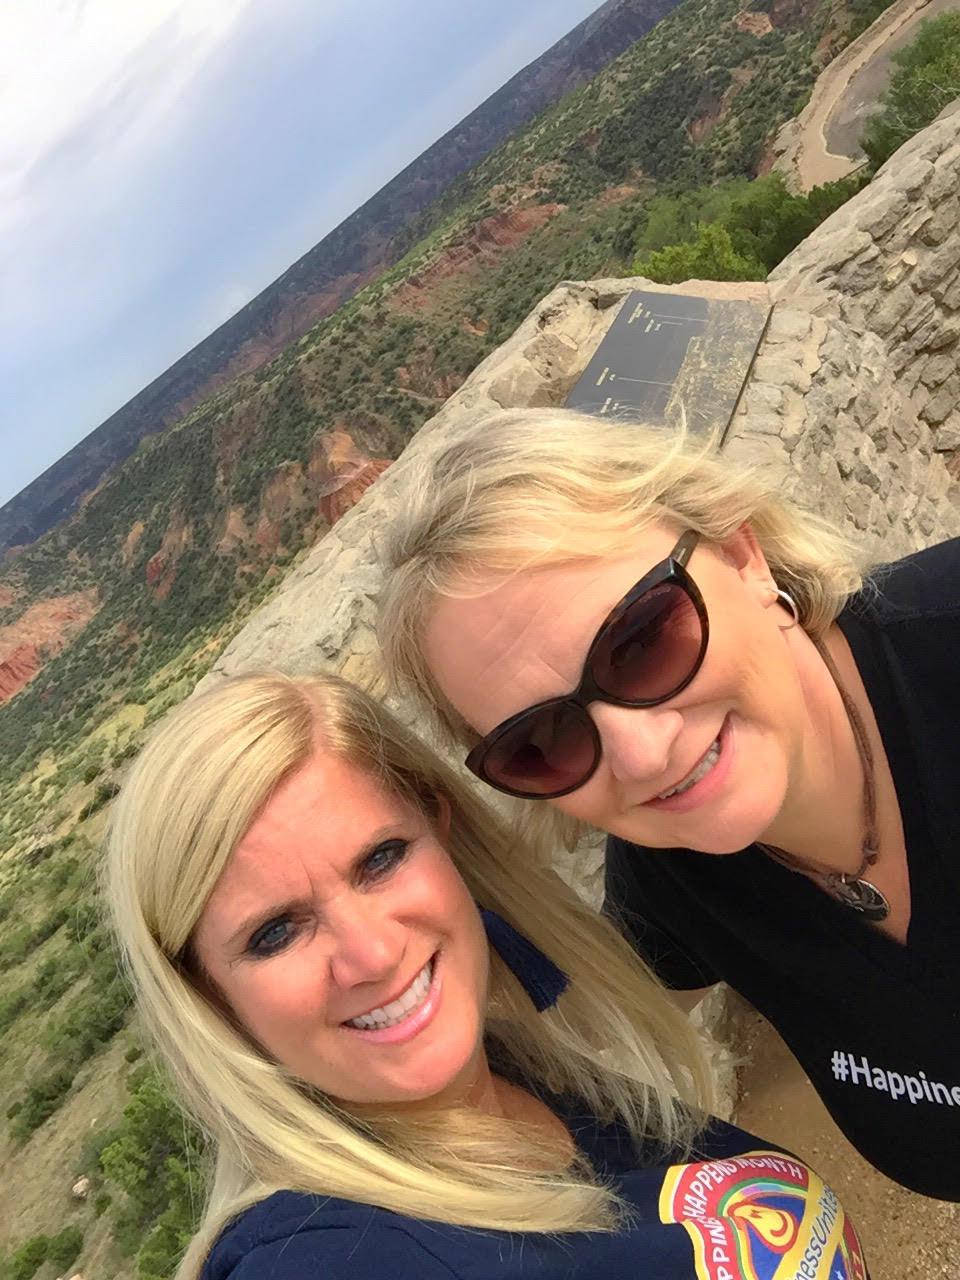 HappinessUnites Tour Amarillo, Happiness Happens Month, #HappinessUnites, Secret Society of Happy People, SOHP.com, Pamela Gail Johnson, Amarillo TX, Palo Dura Canyon